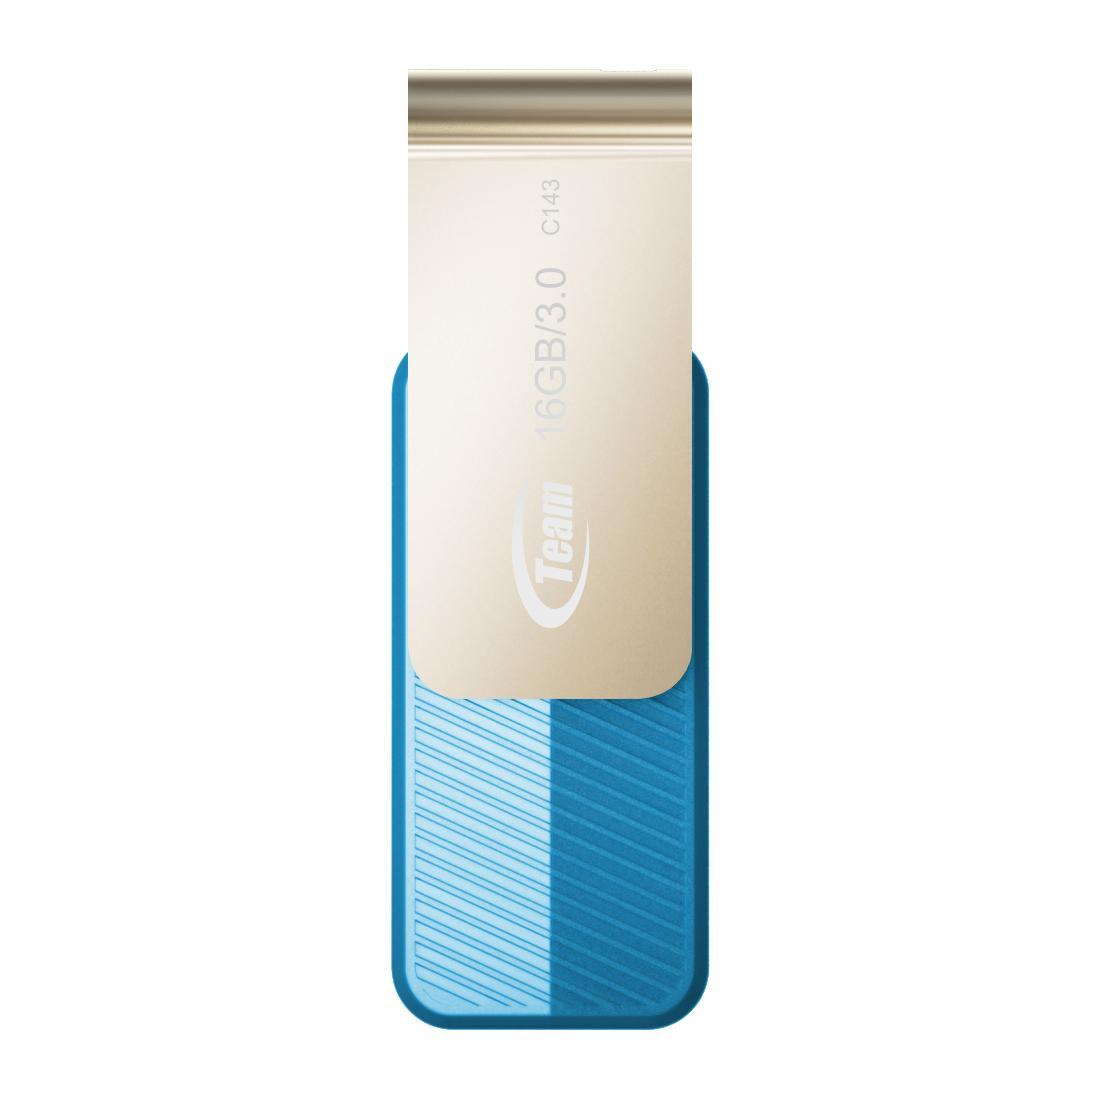 USB памет Team Group C143 16GB USB 3.0, Син